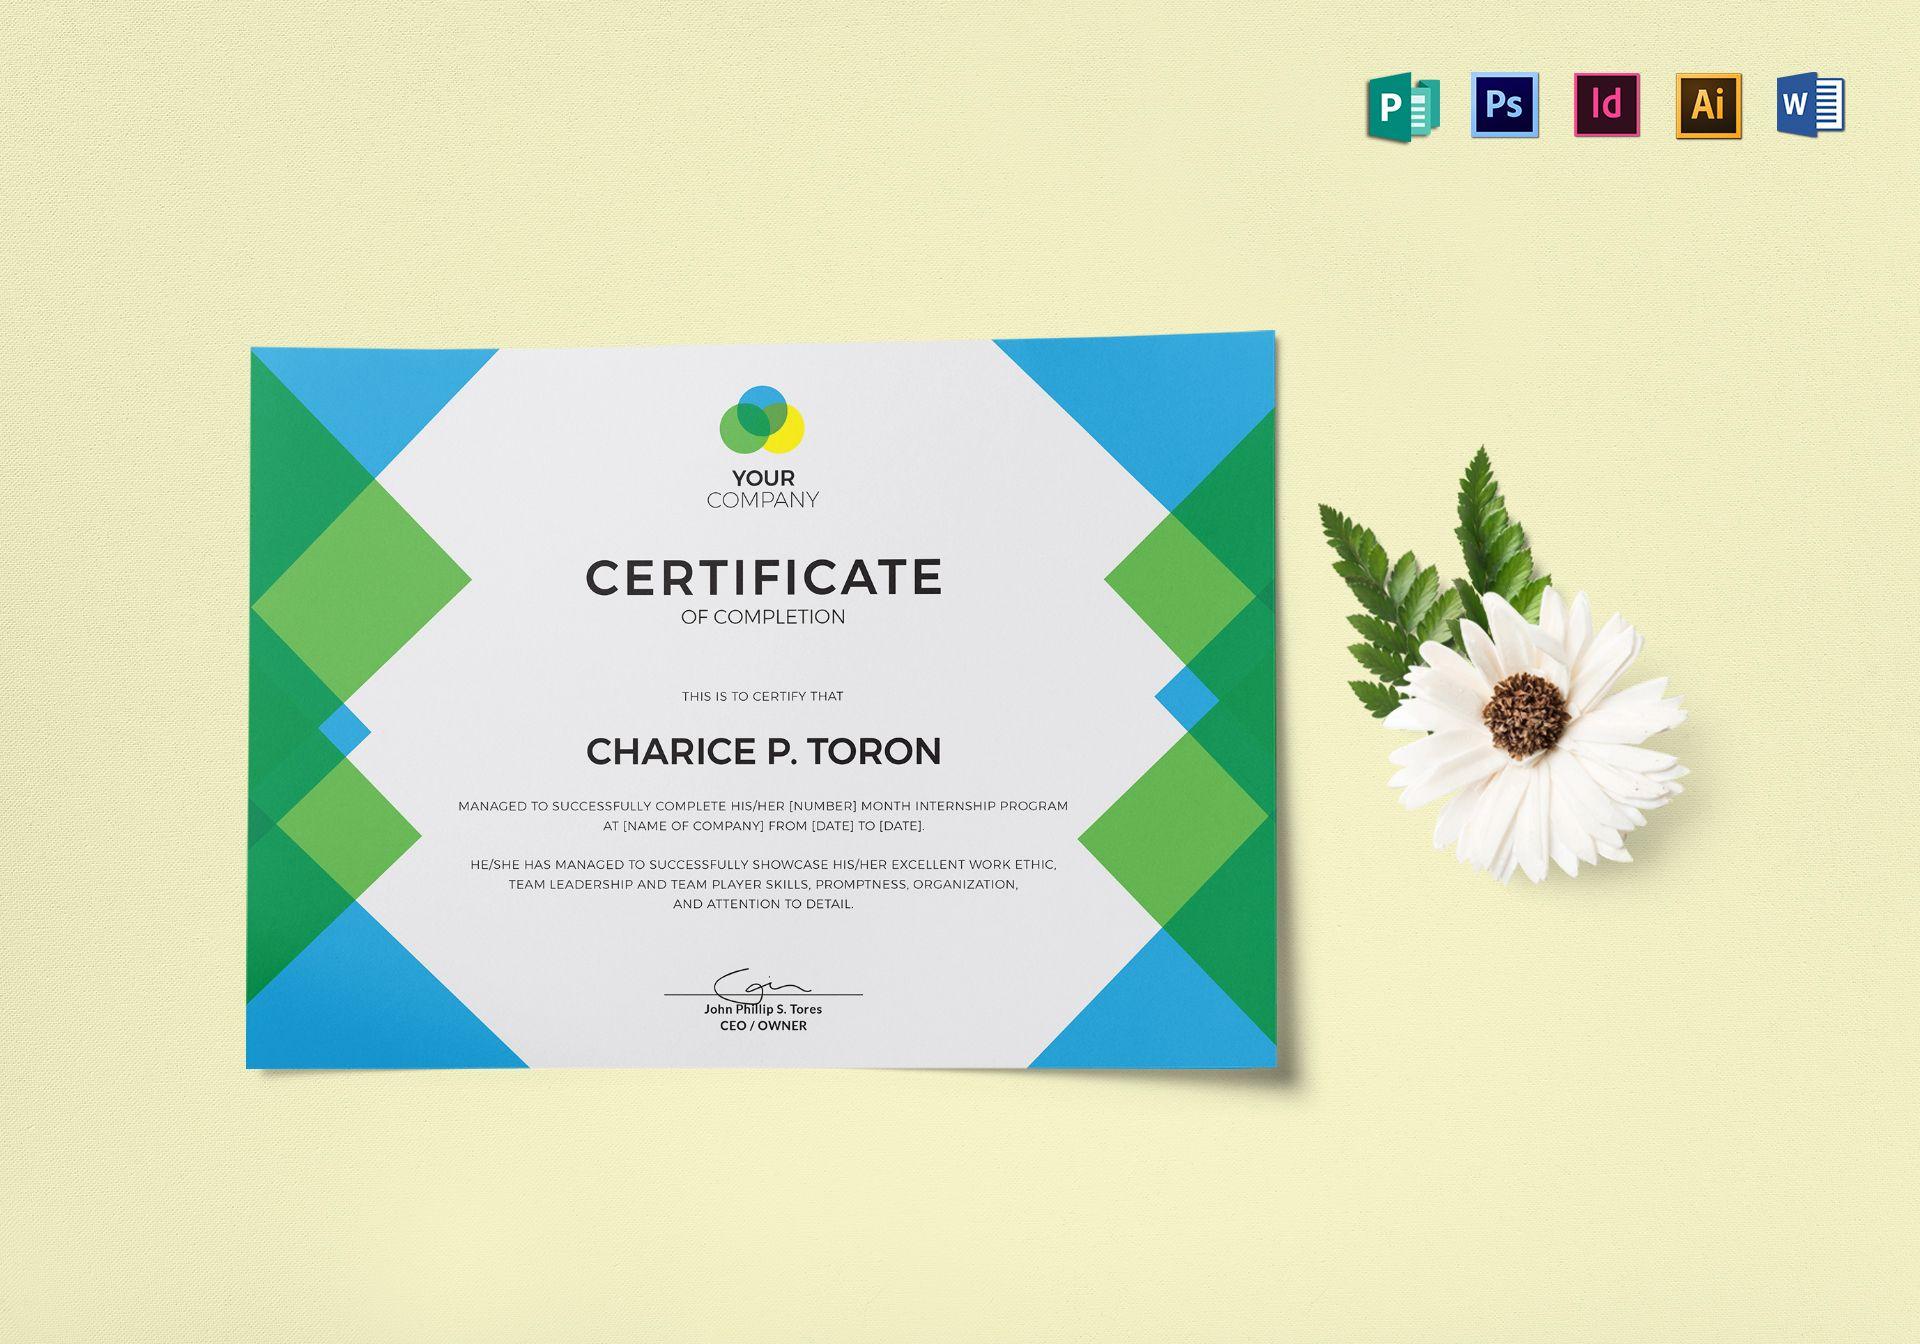 Company Internship Certificate Design Template In Psd Word